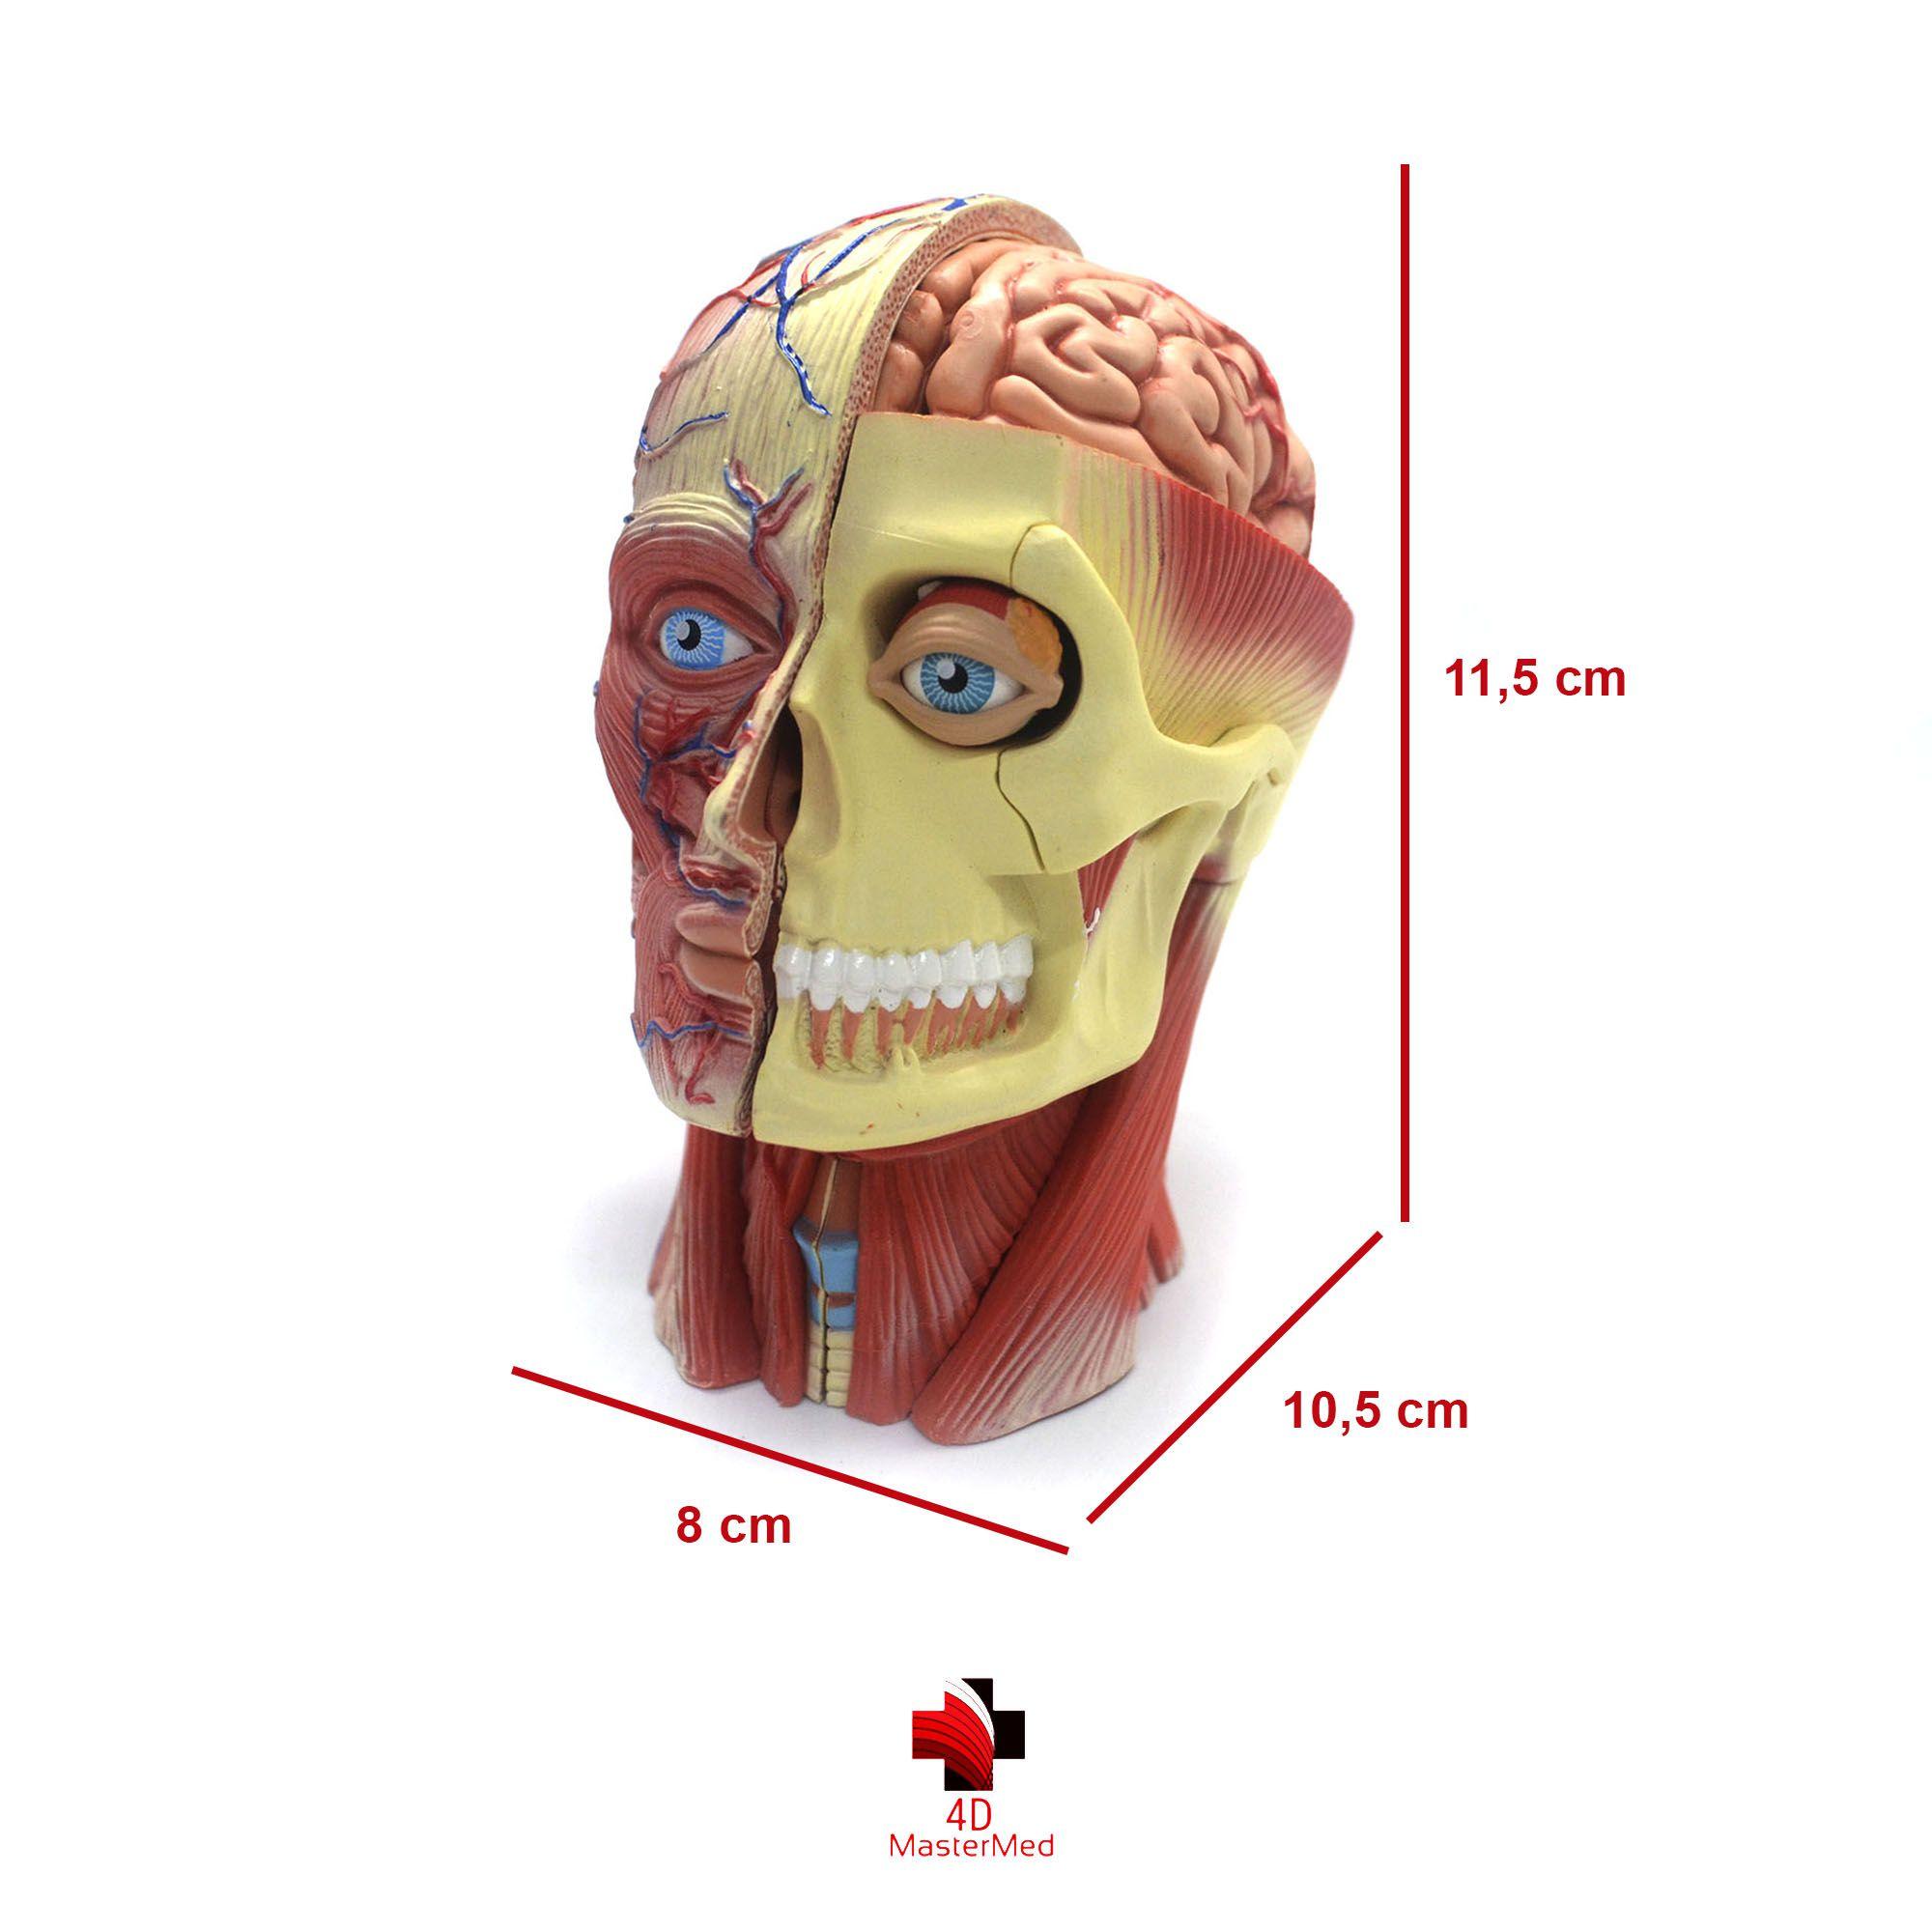 Anatomia da Cabeça Humana